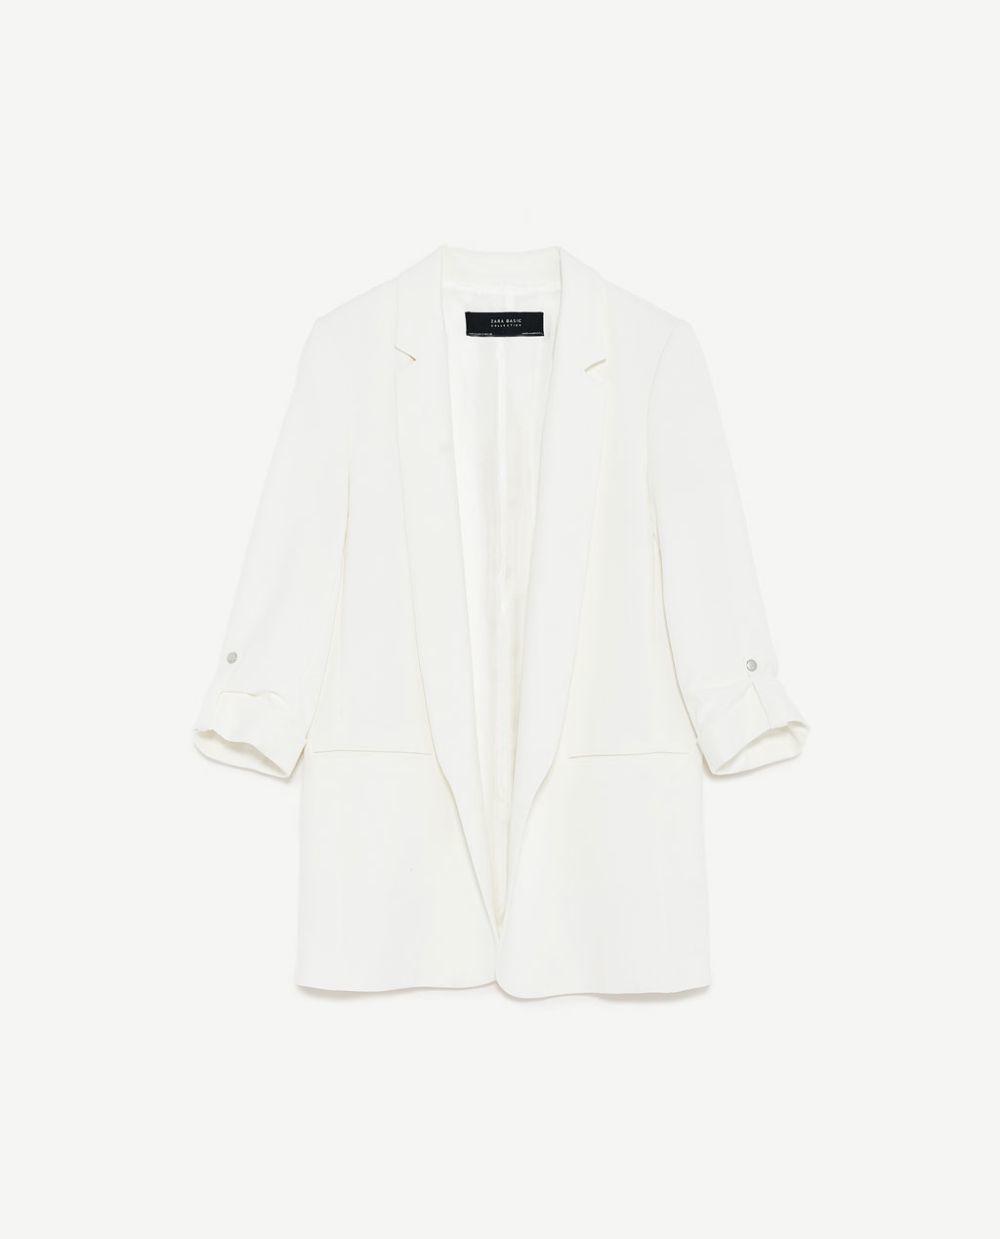 Blazer blanco roto. De Zara (39,95 euros).